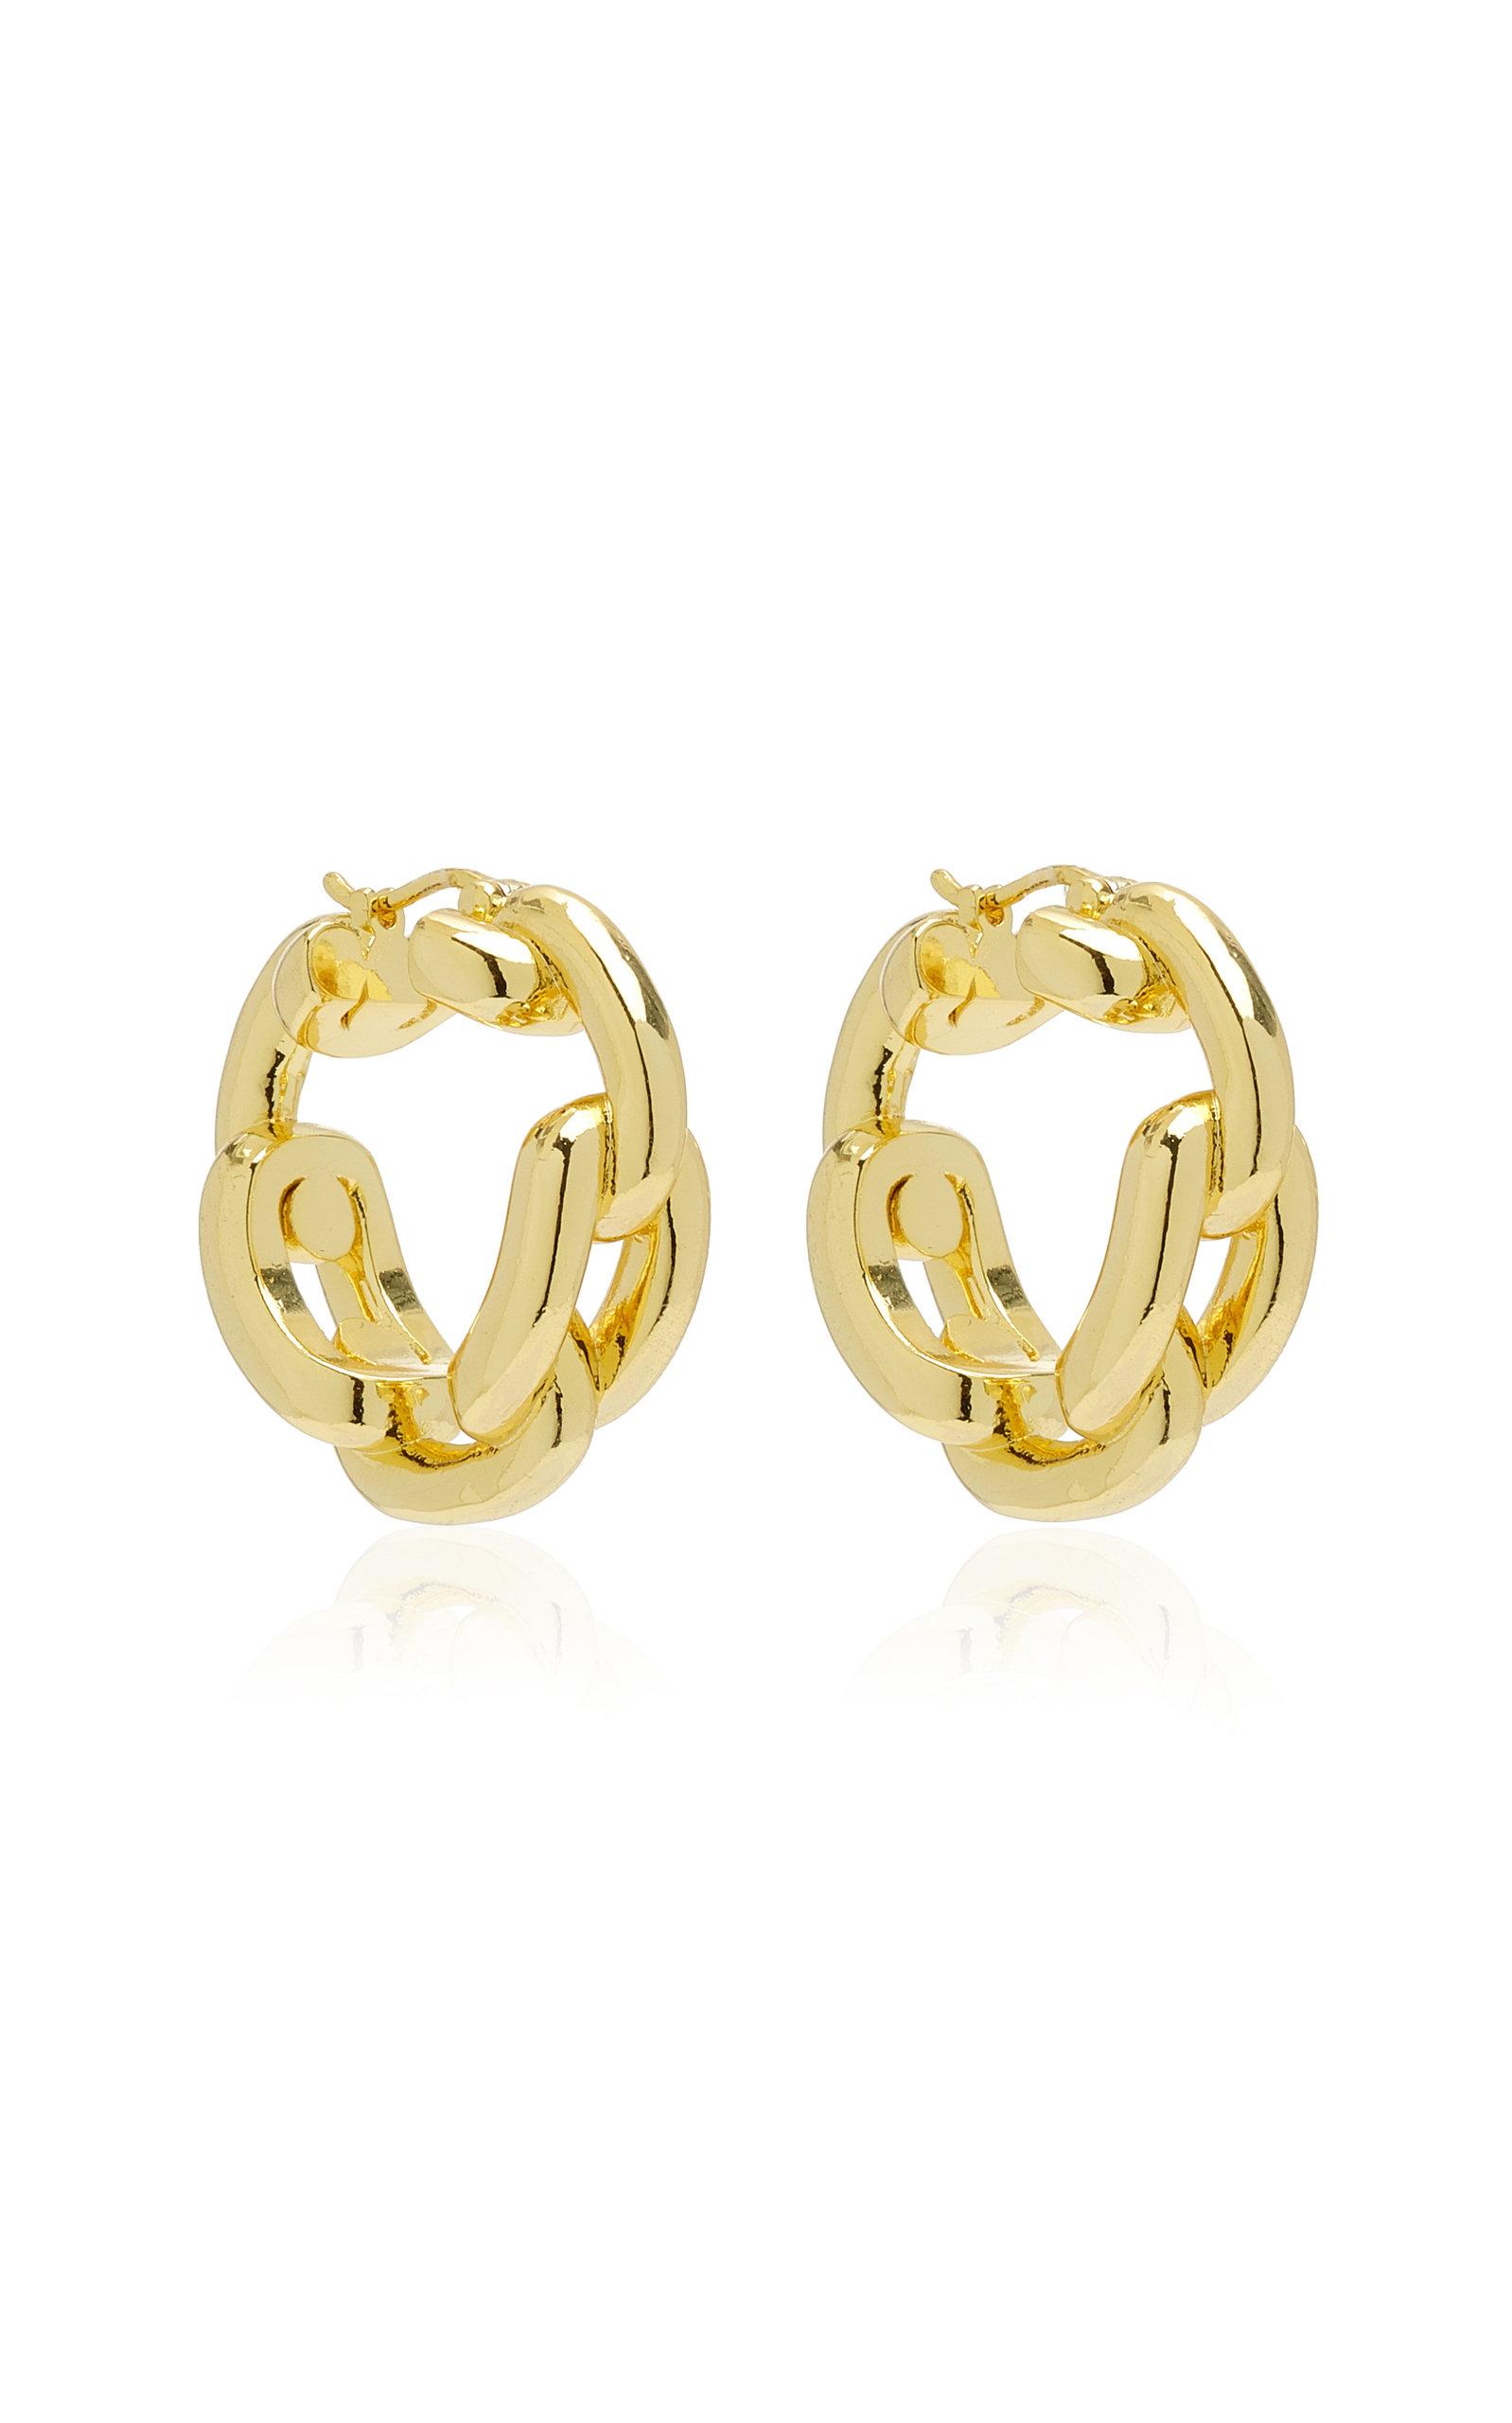 Emili - Women's Rory 14K Gold-Plated Hoop Earrings - Gold - Moda Operandi